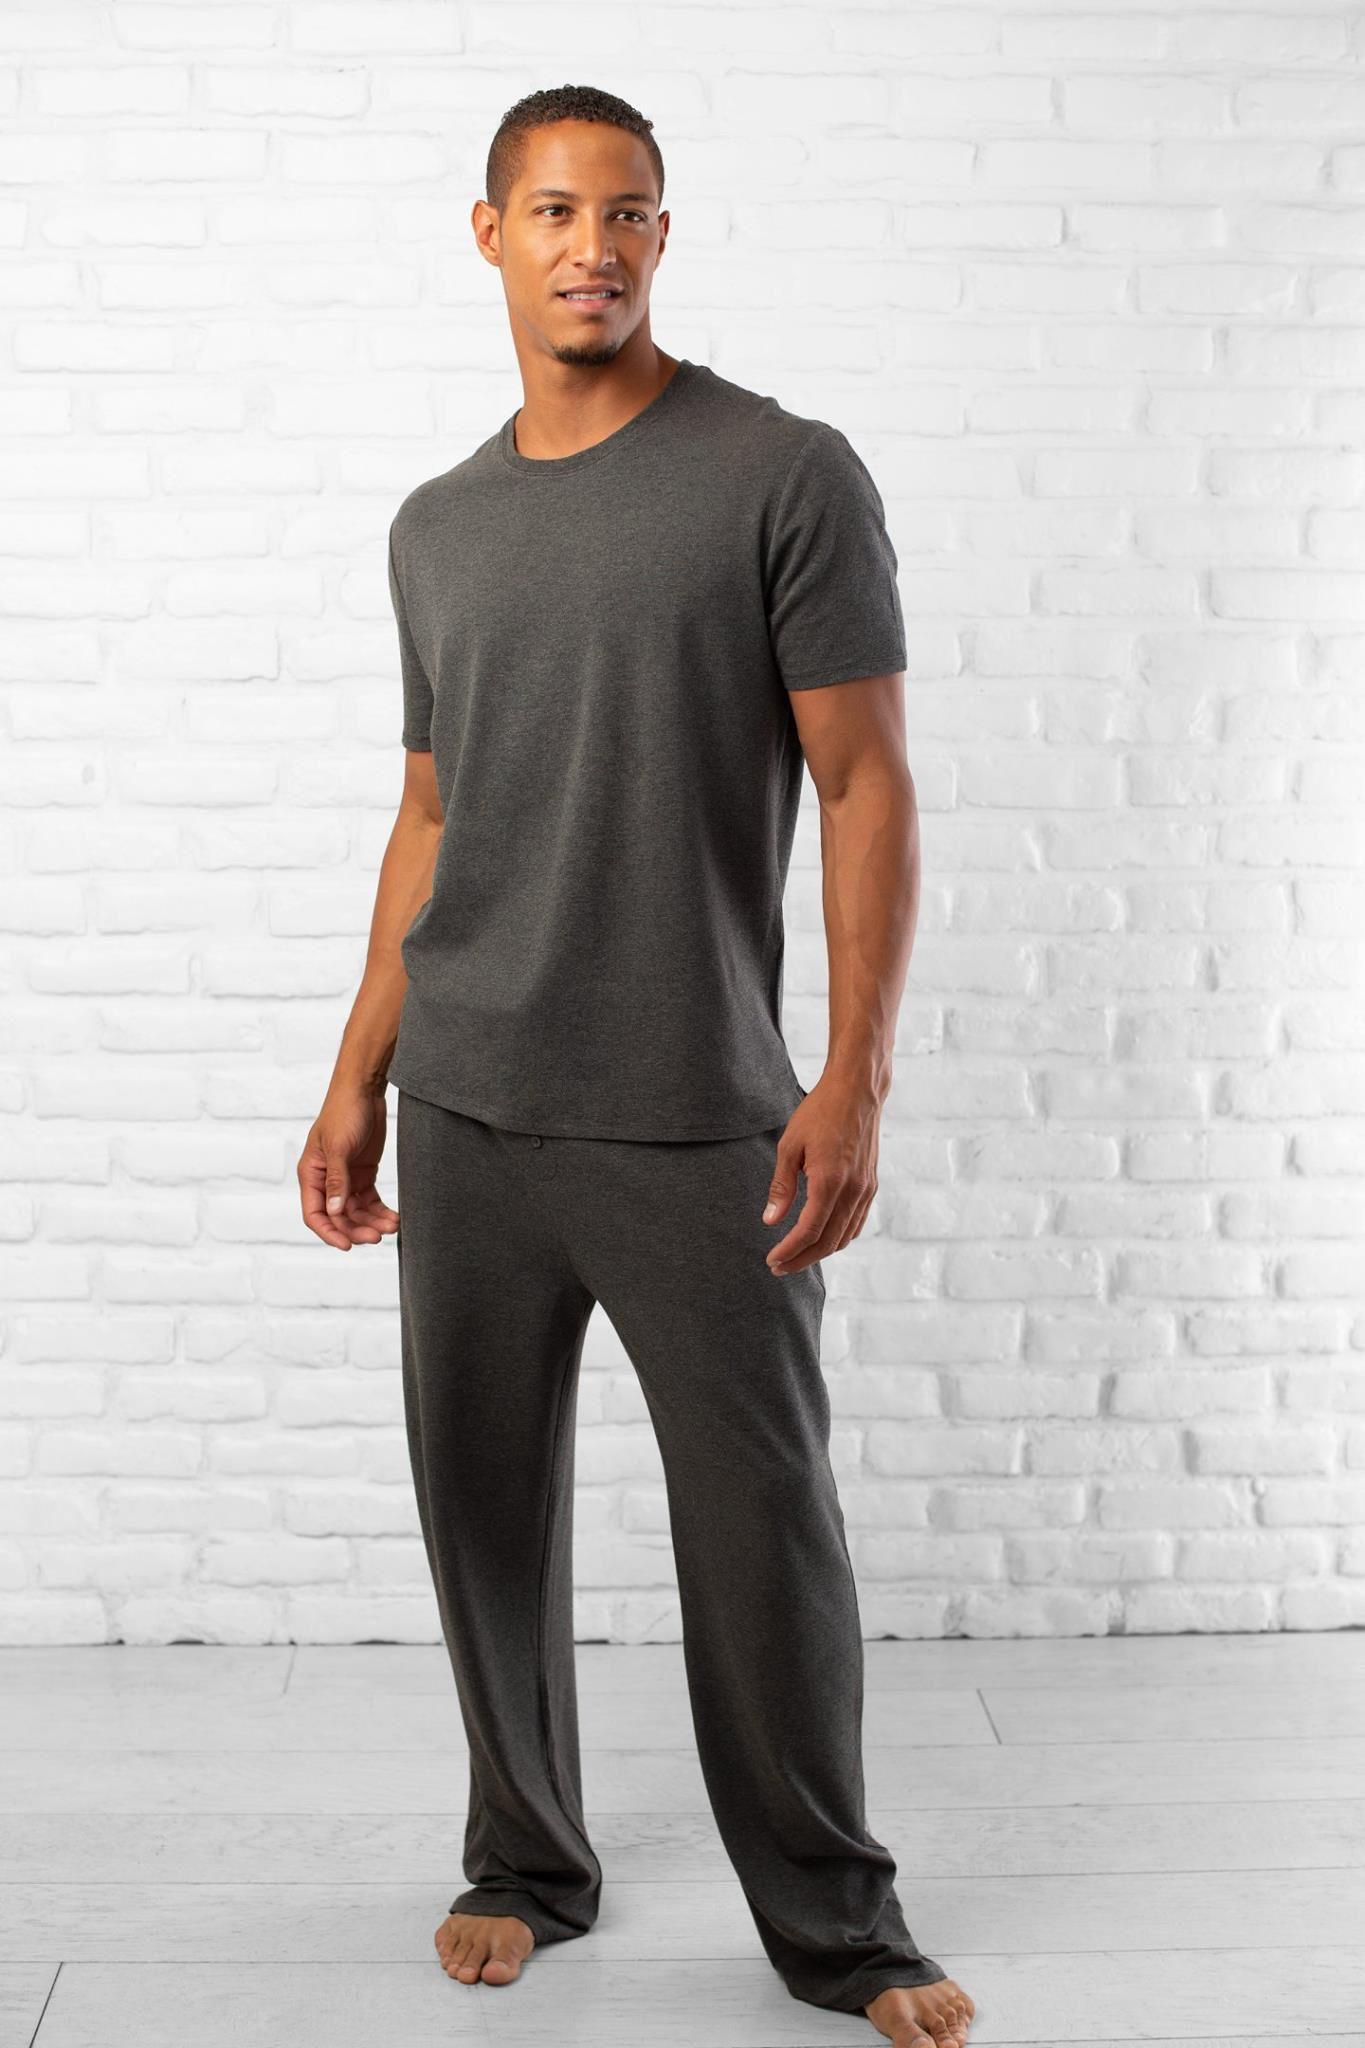 Men's Bamboo Sleep Shirt and Pants Bamboo fashion, Ship